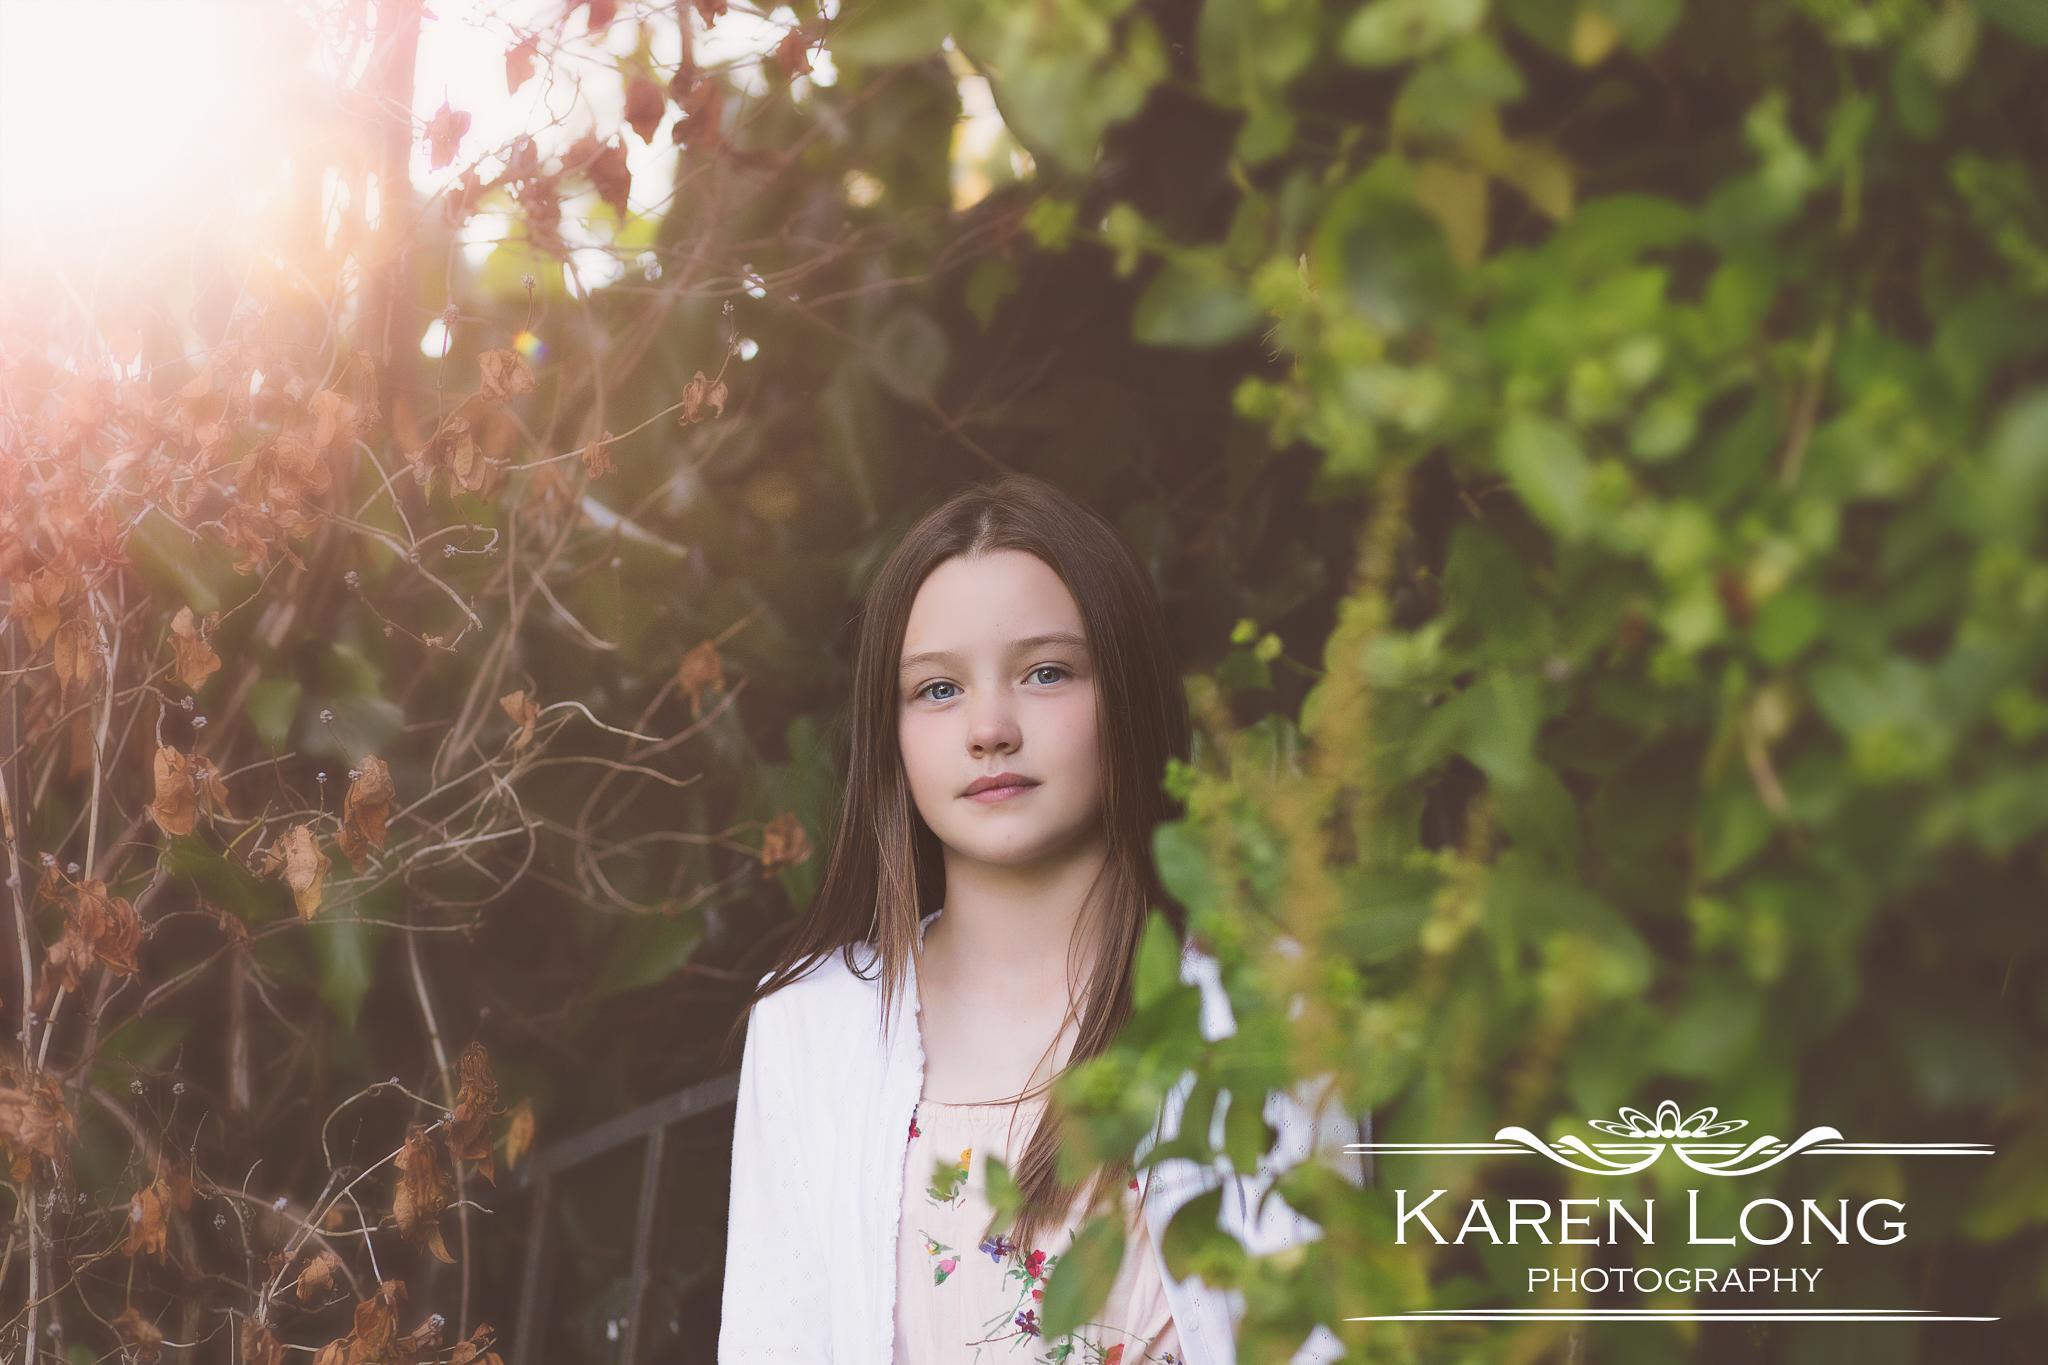 Beaut by karenlongphotography